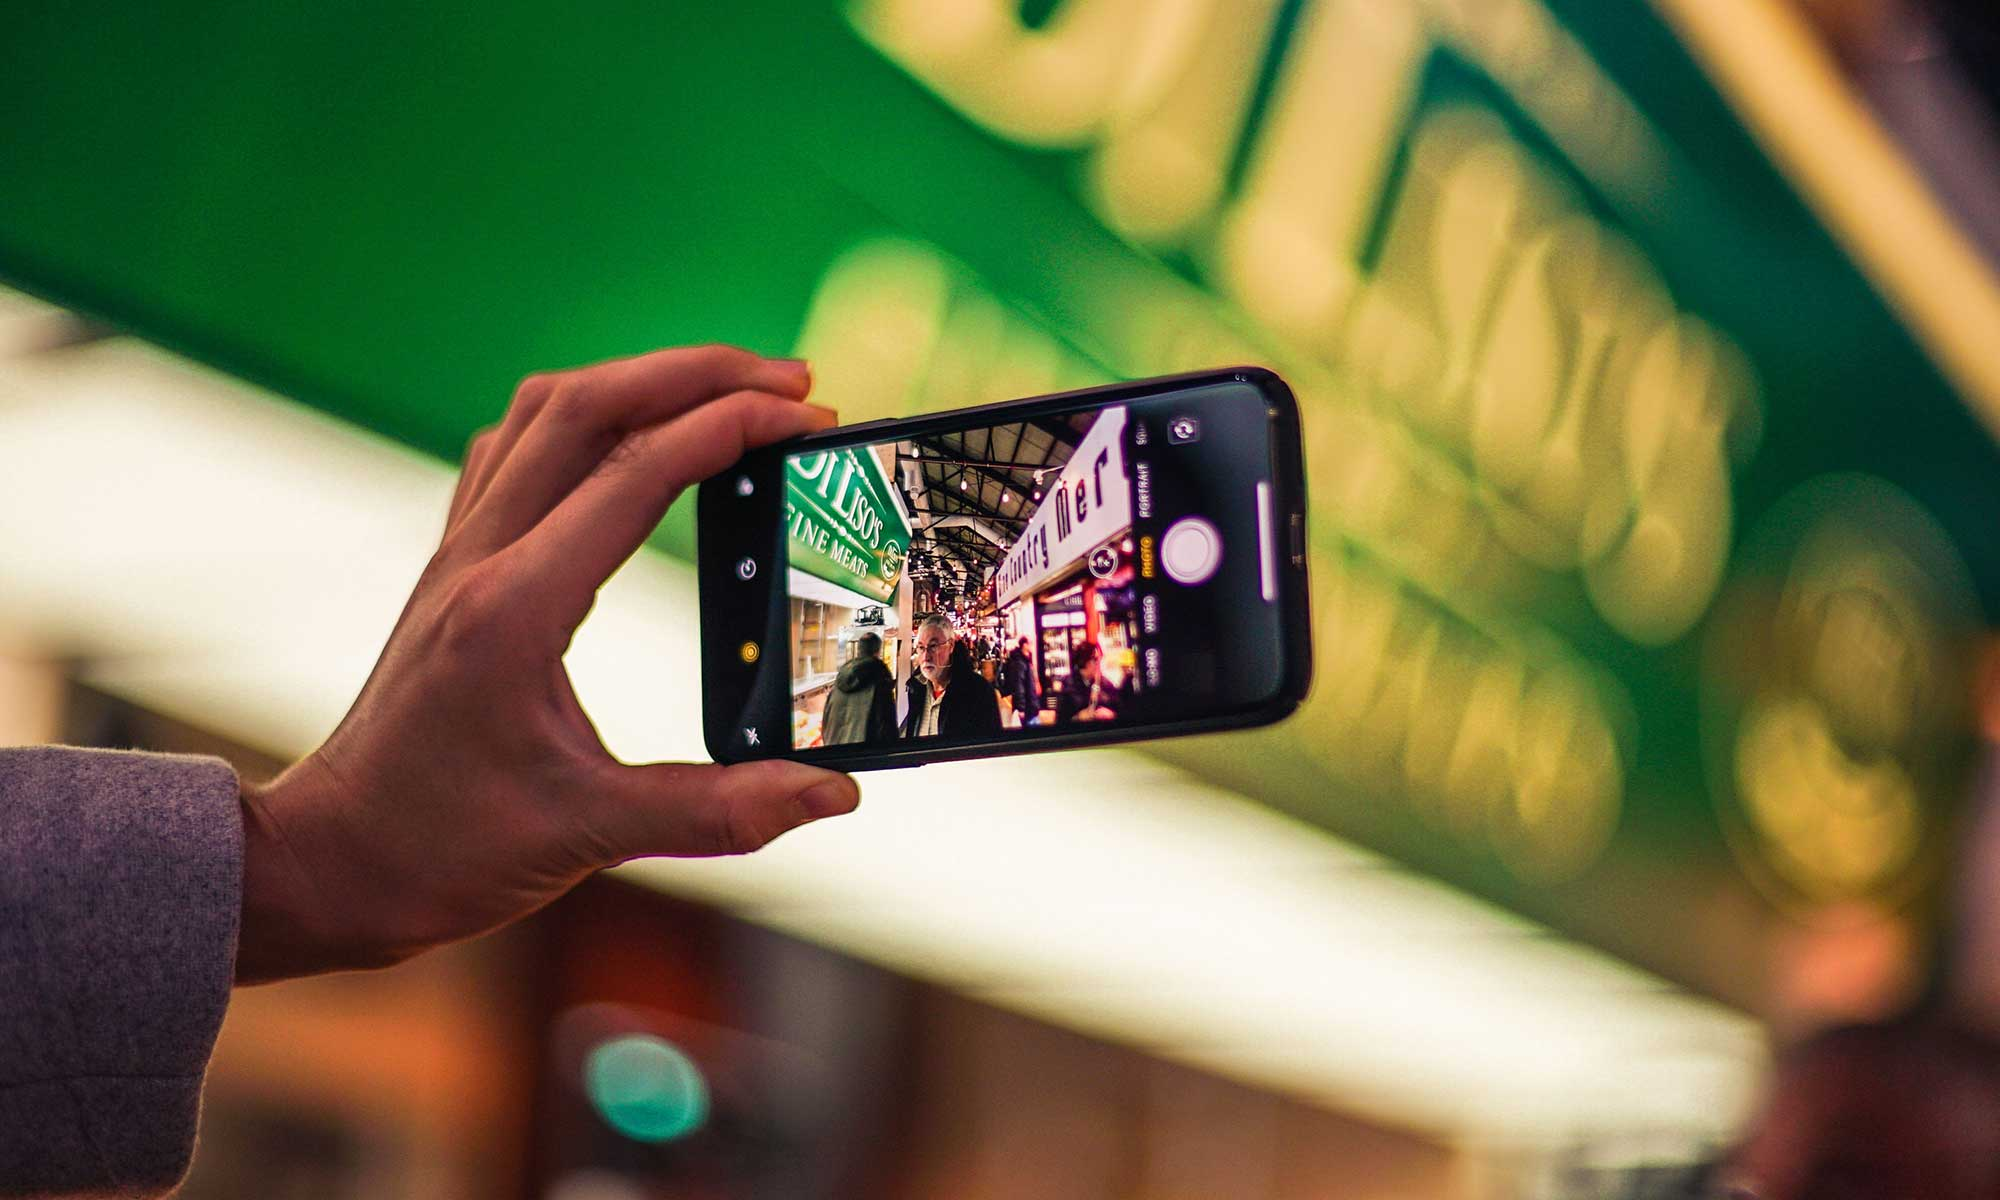 Effective social media video